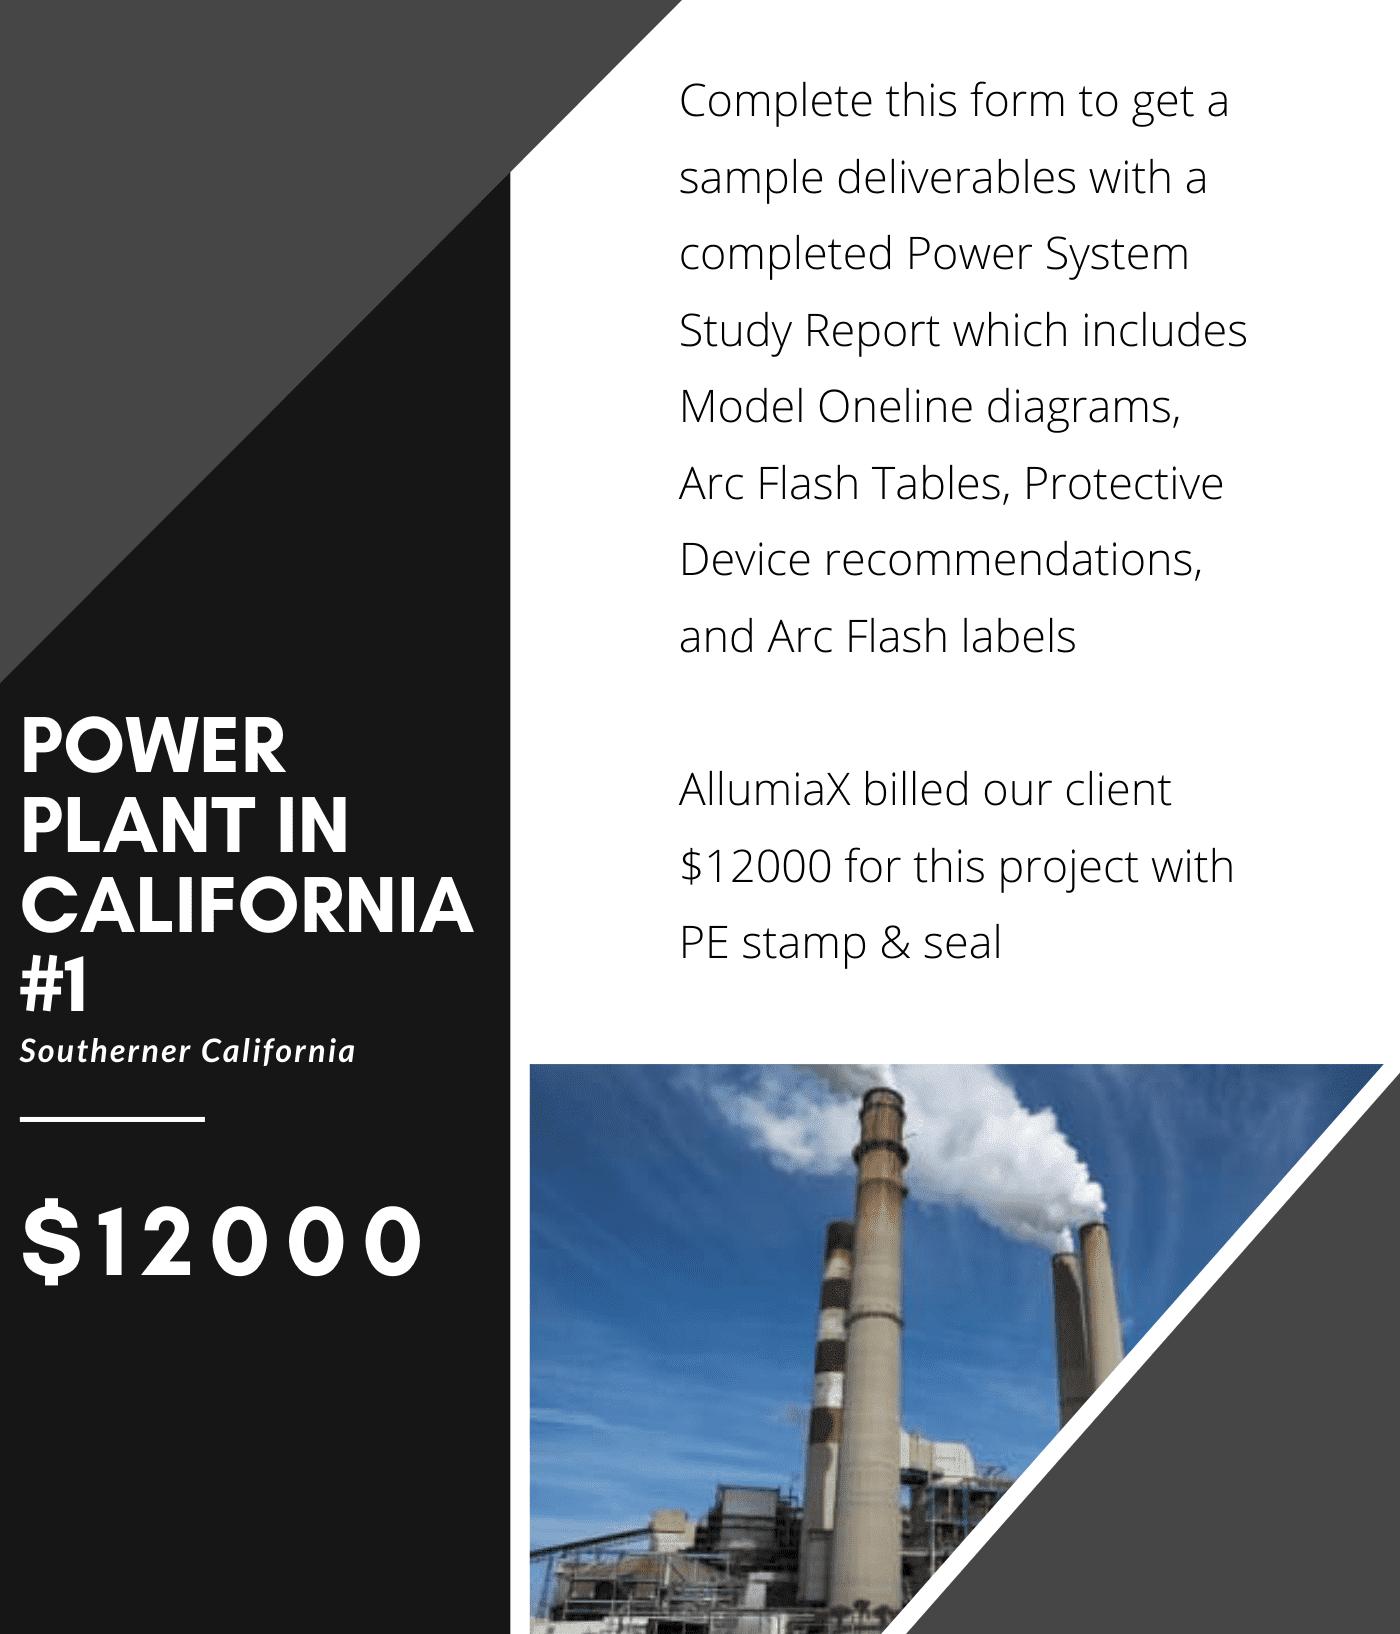 Power Plant in California #1